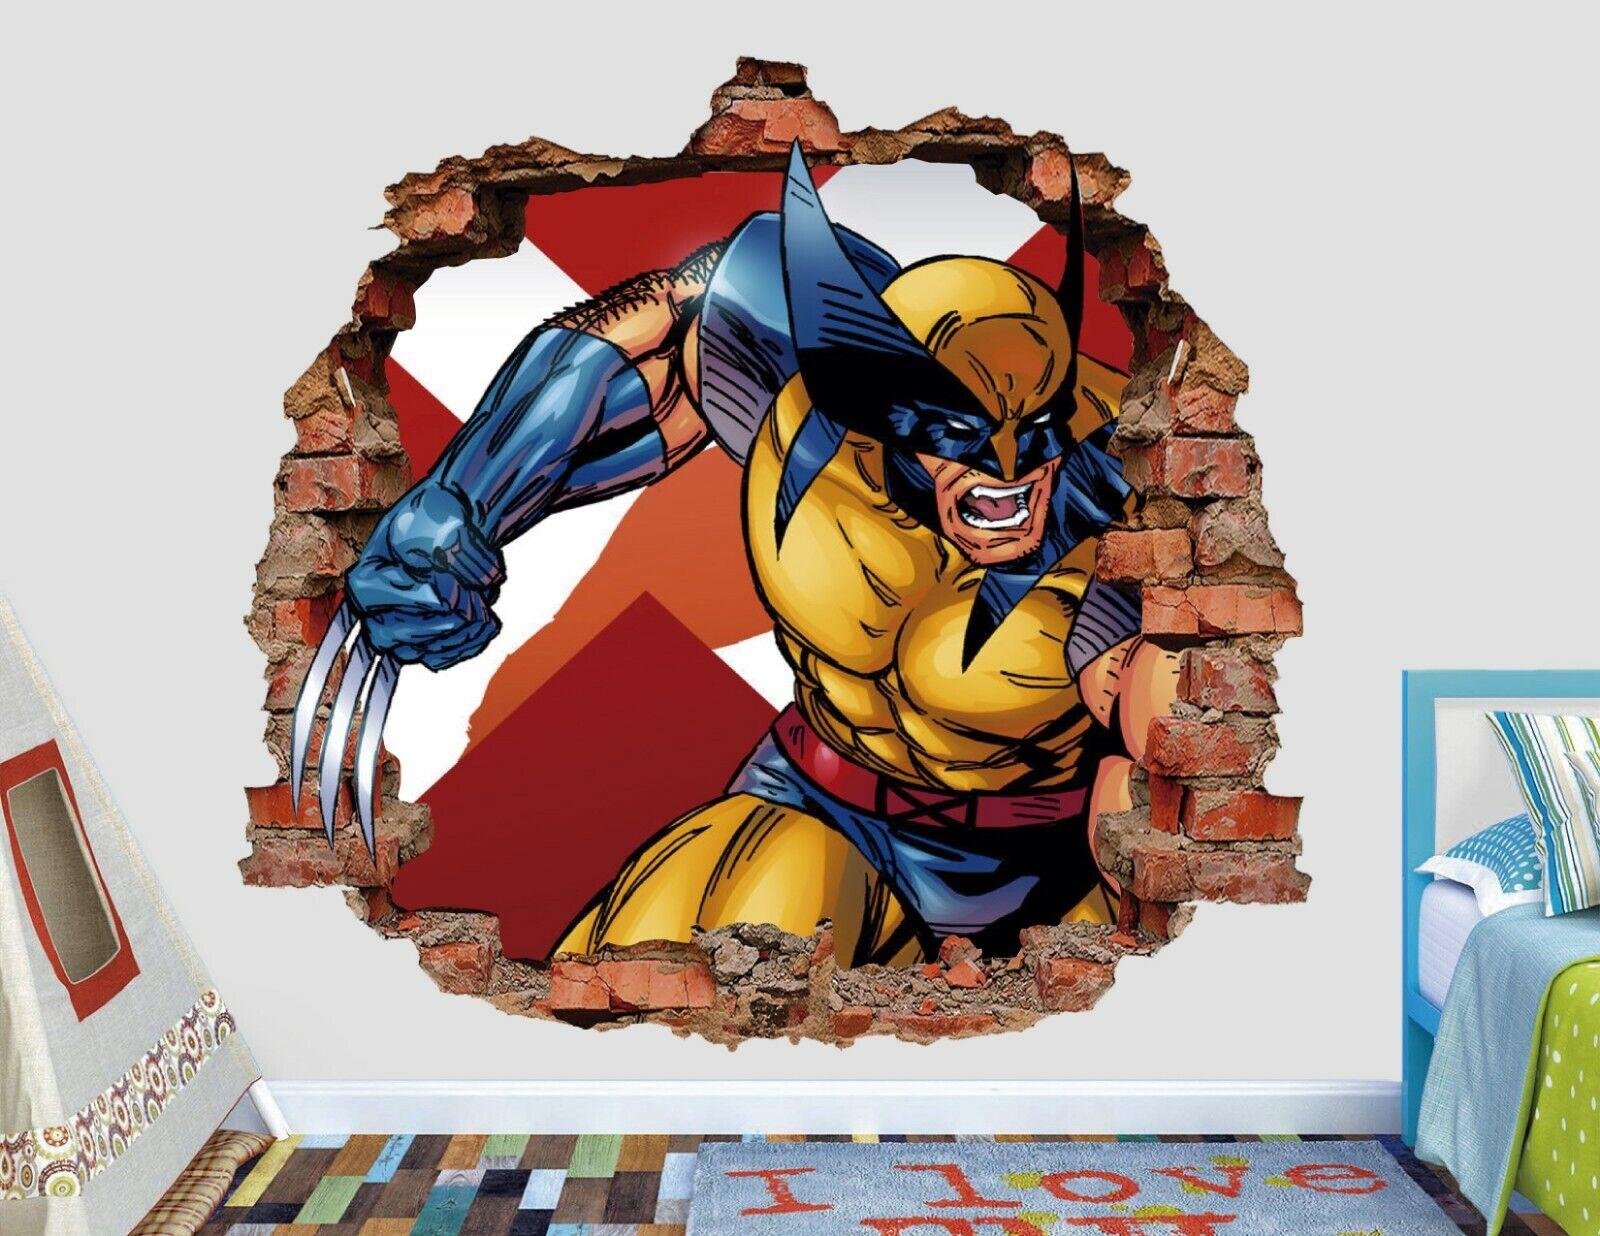 X Men Wolverine Attack Brick Wall Decal Kids Smashed 3D Sticker Art Vinyl AH286